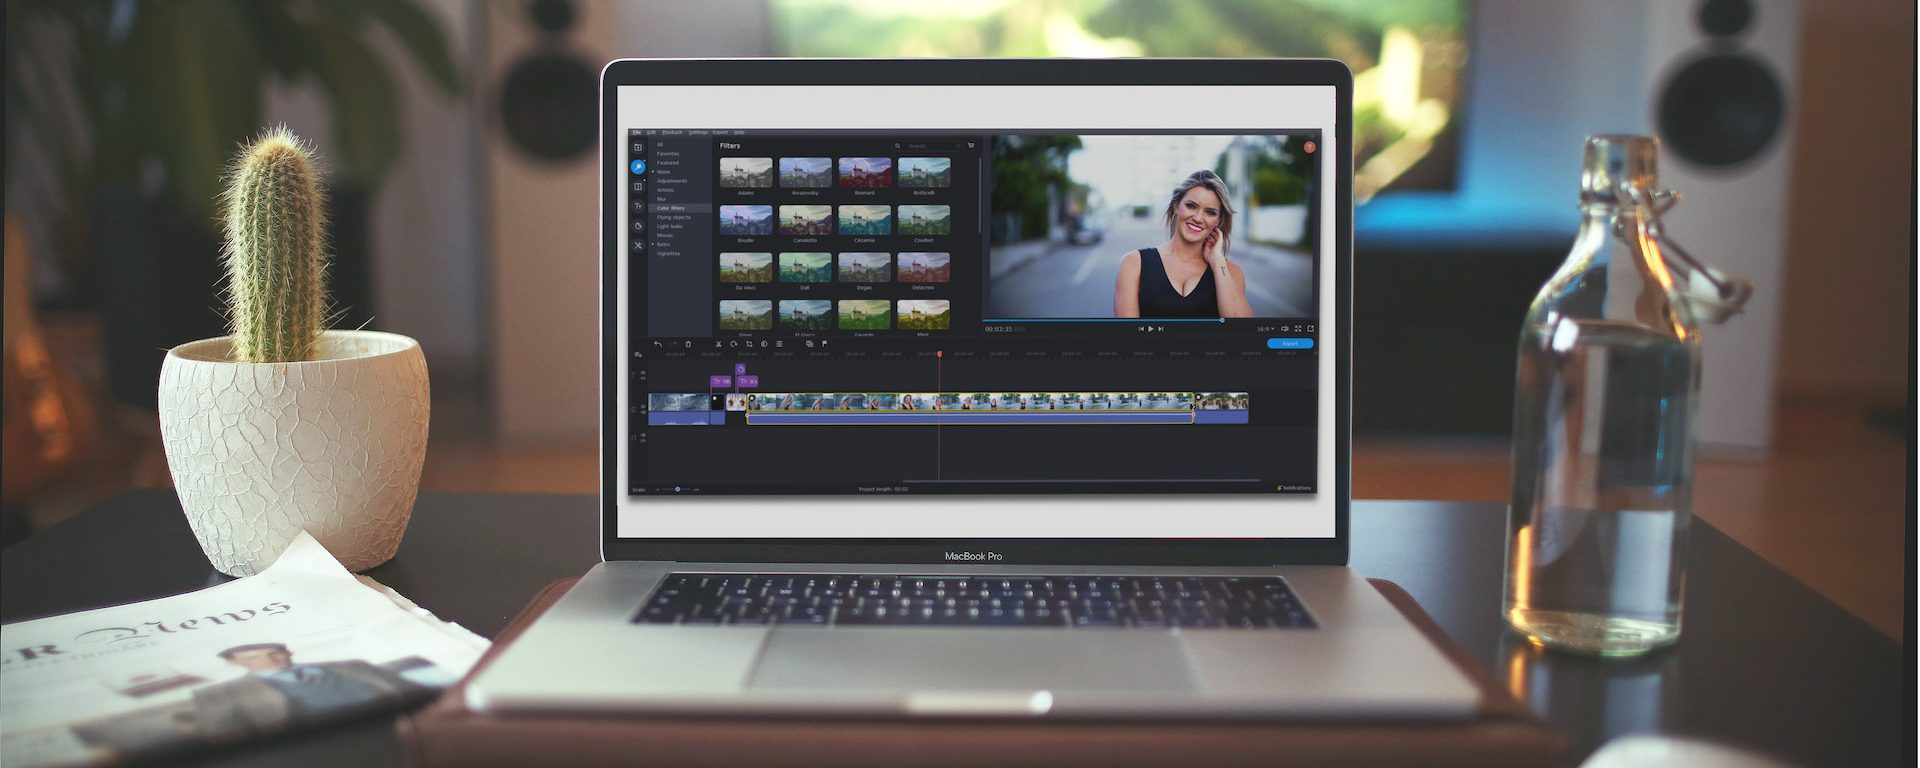 2020 Macbook Pro Review.Movavi Video Editor Plus 2020